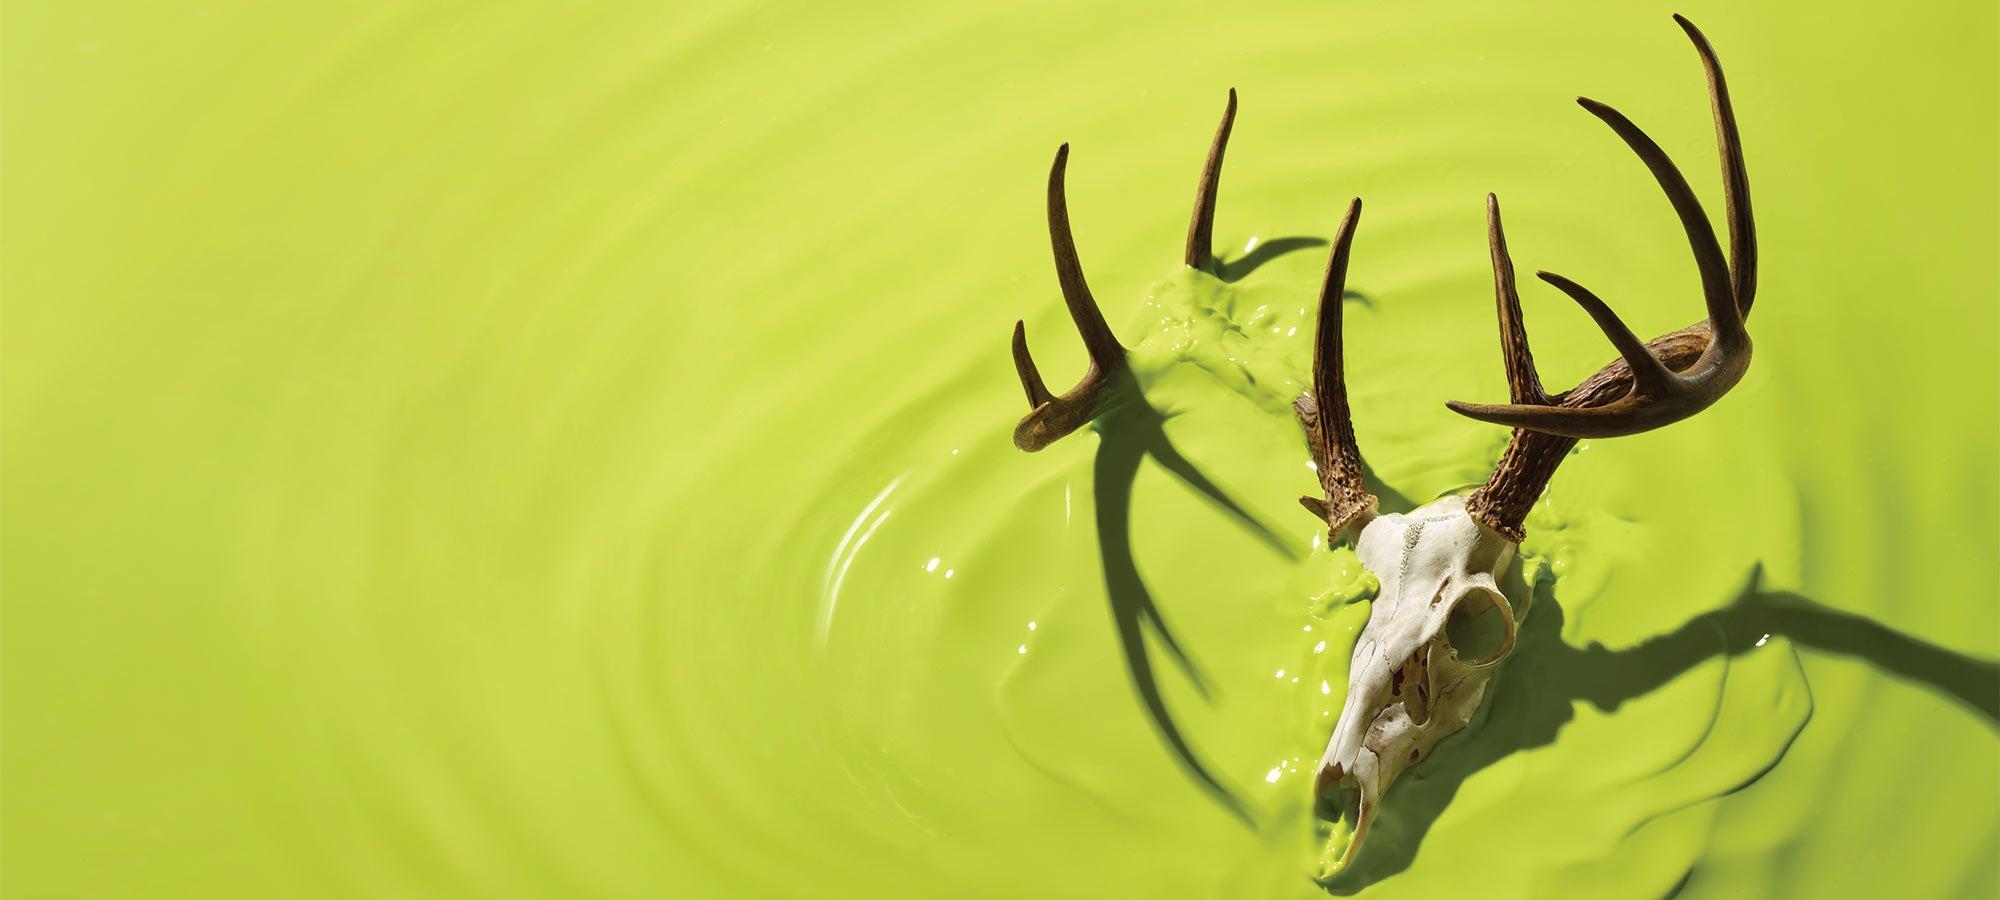 deer skull and antlers in green liquid